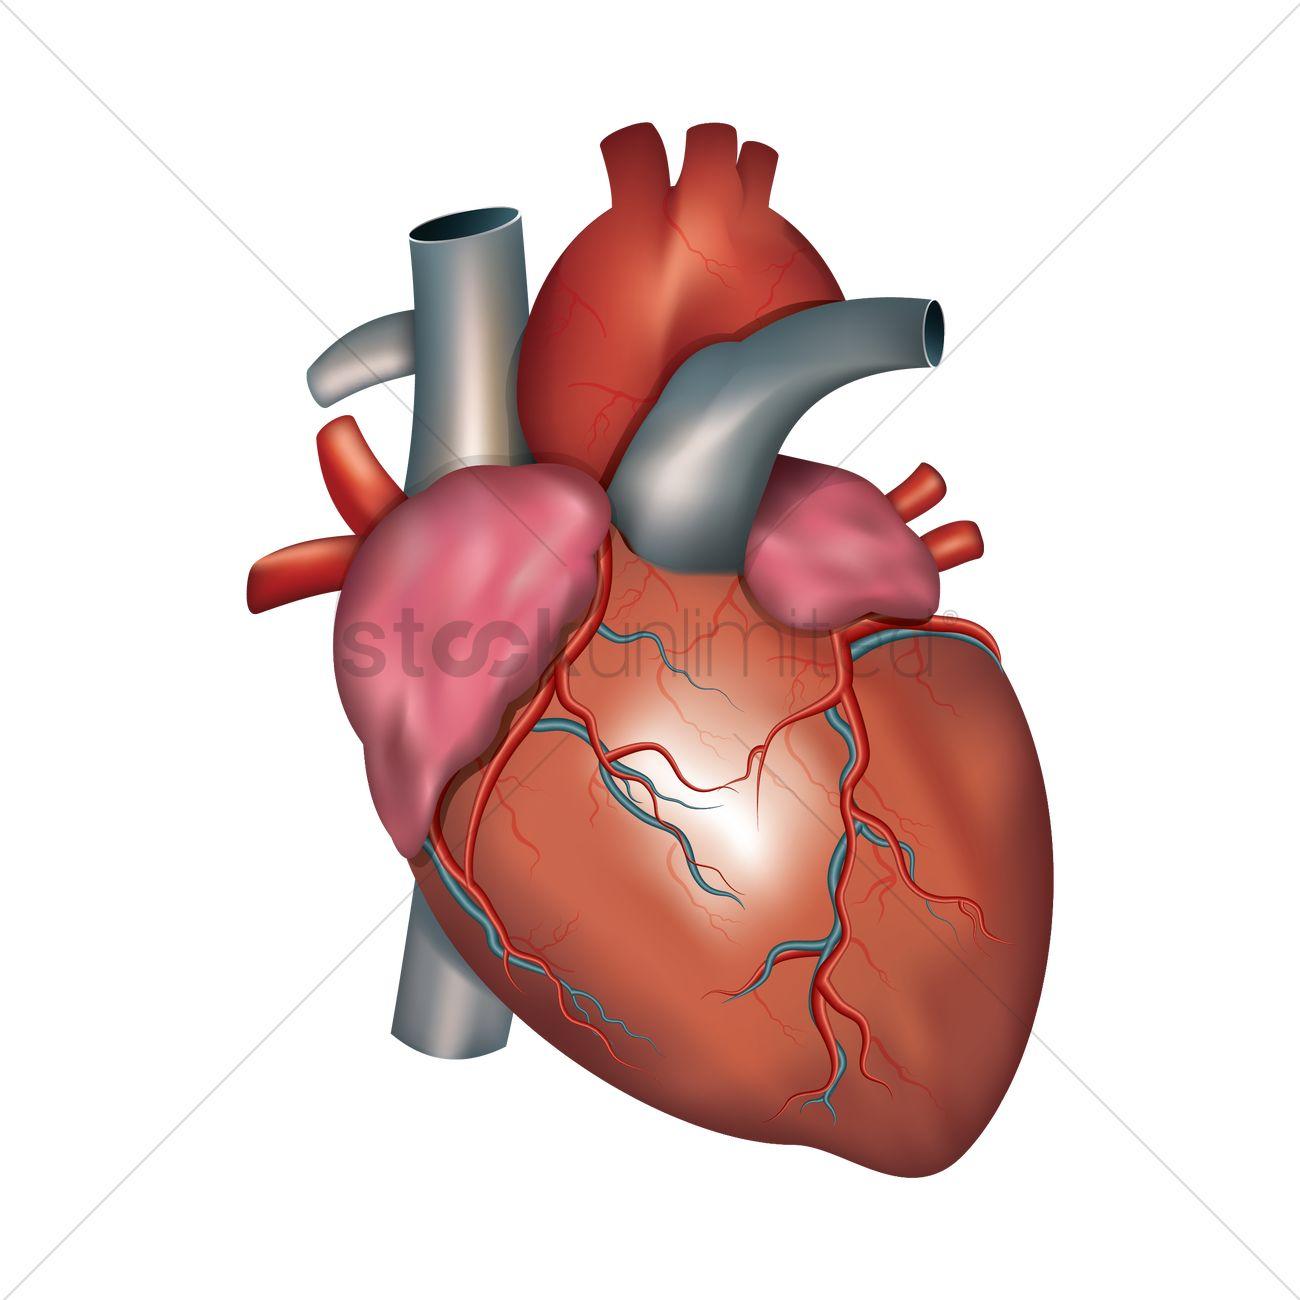 Circulatory System Grade 8 | Biology Quiz - Quizizz